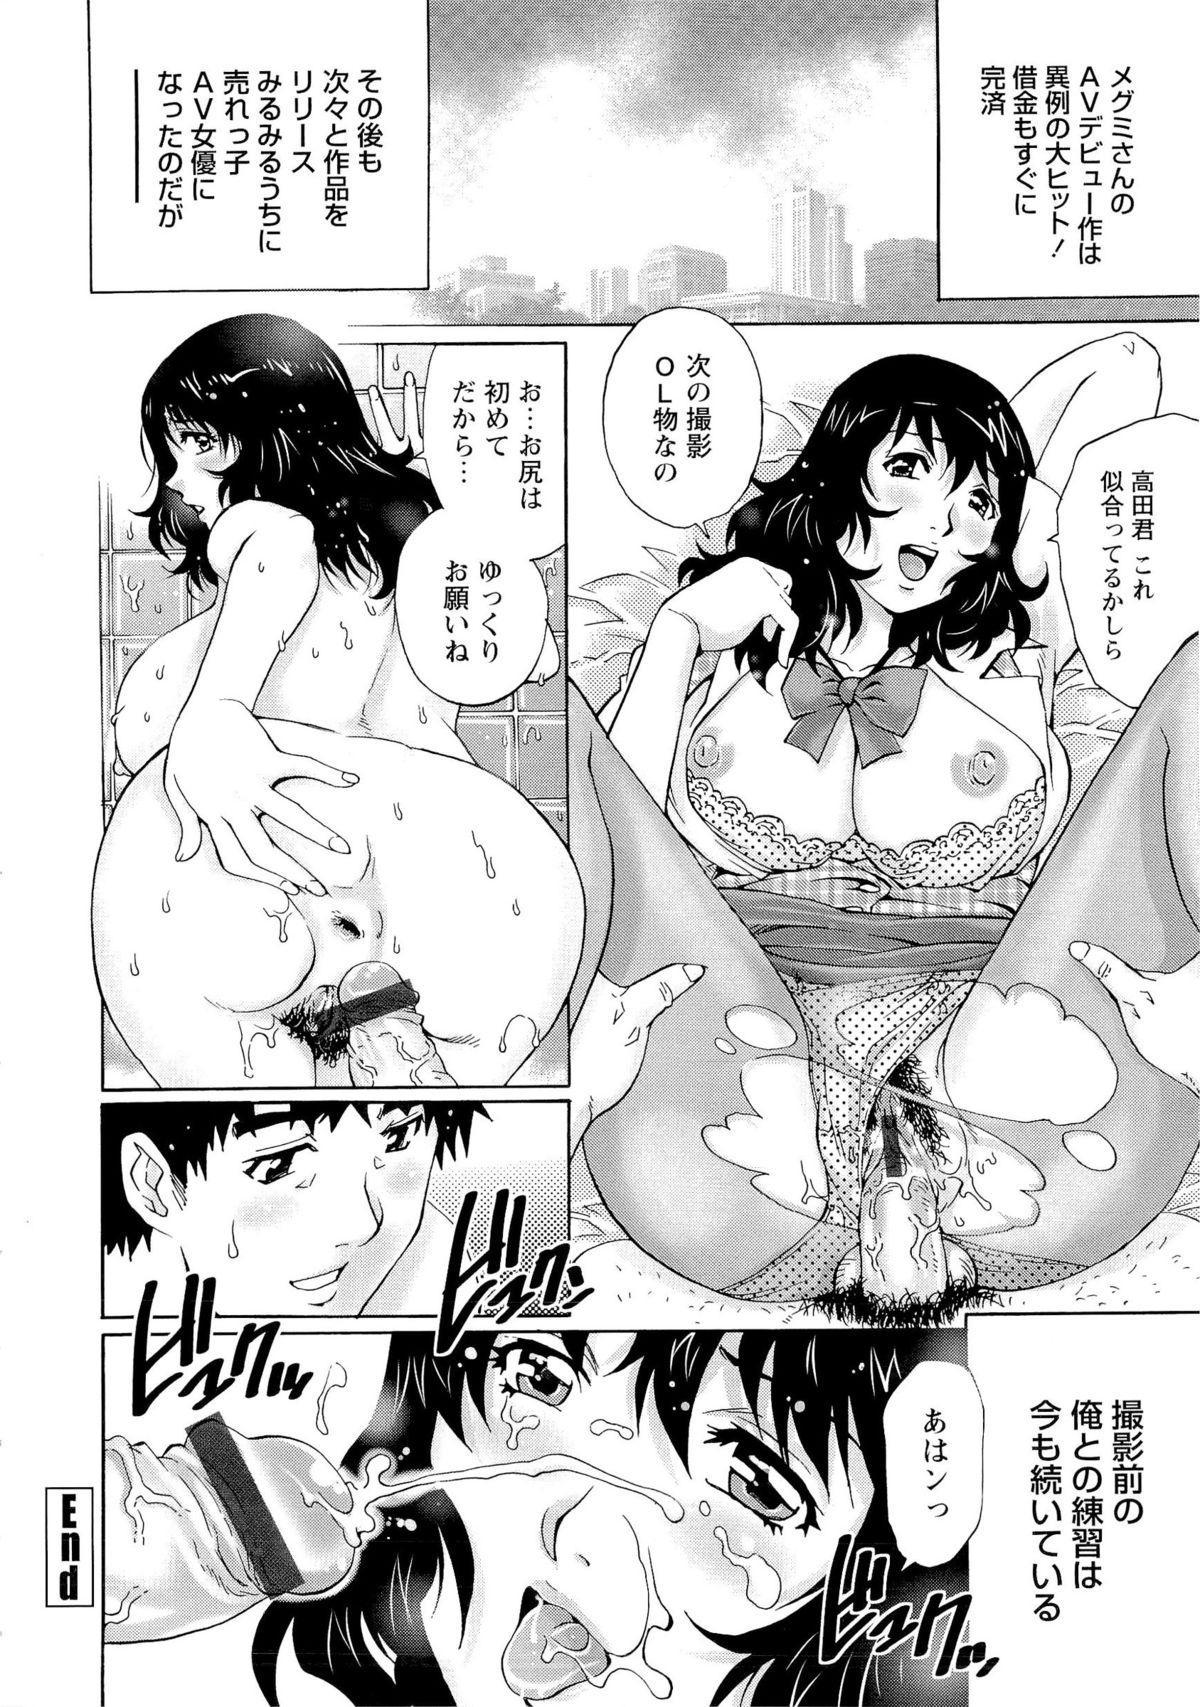 Nureteru Hitozuma - Wetly Wife 184